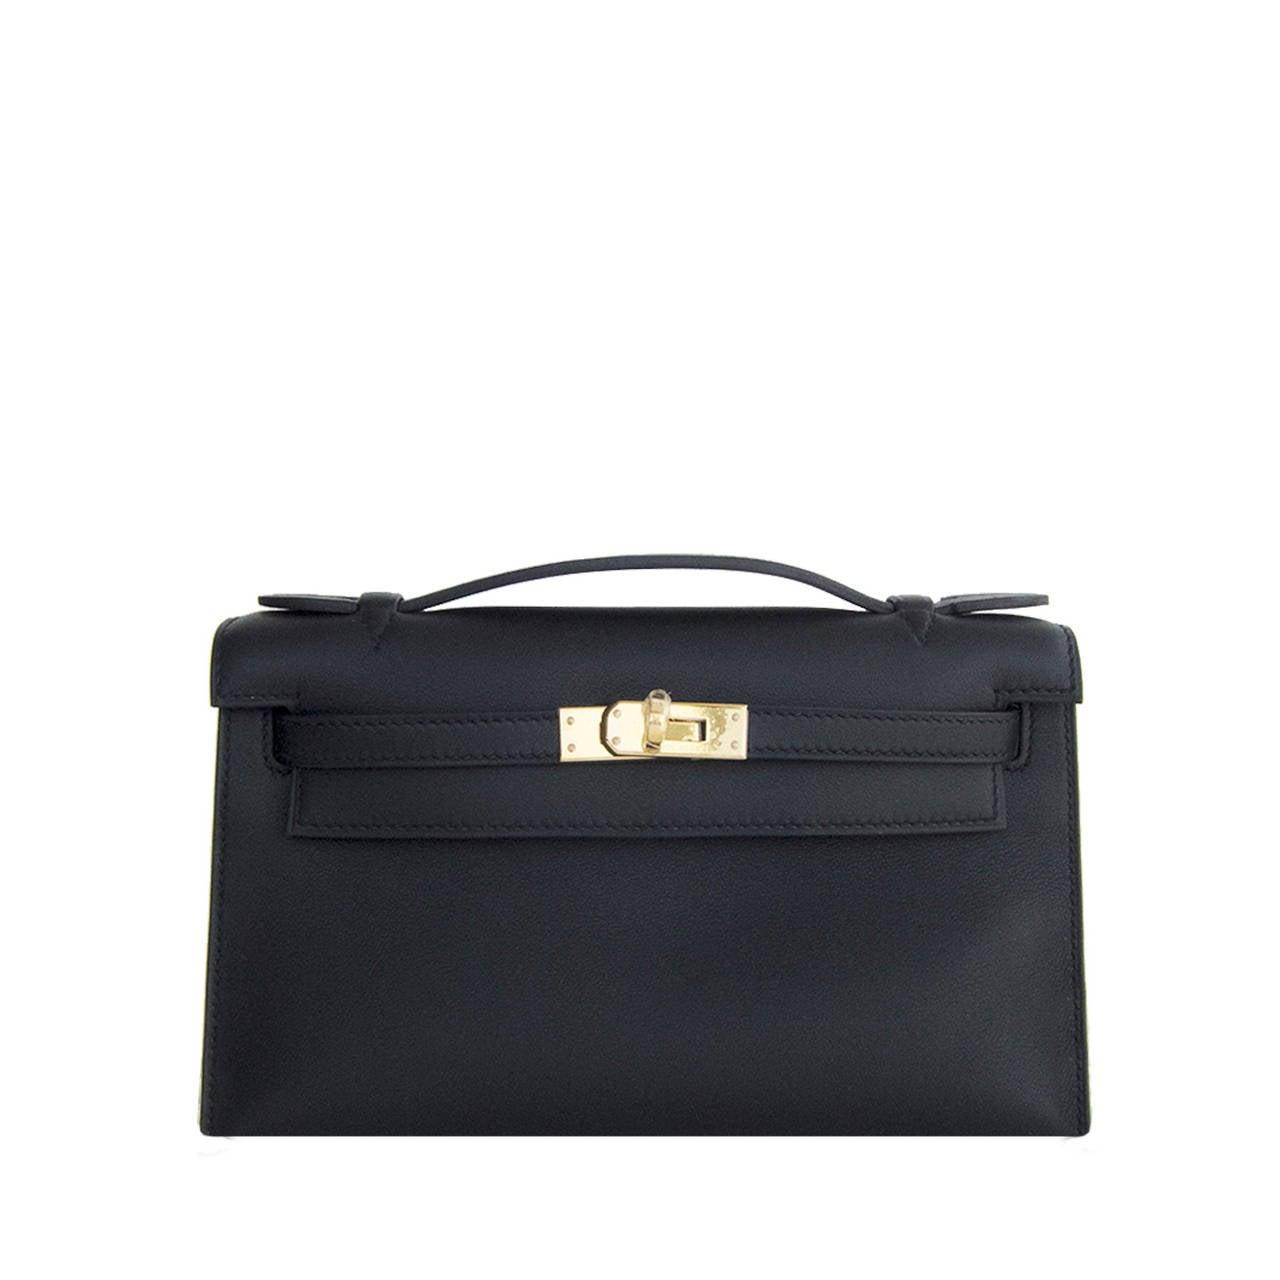 Fashionista Fave Hermes Black Gold Swift Kelly Pochette Cut Clutch ...